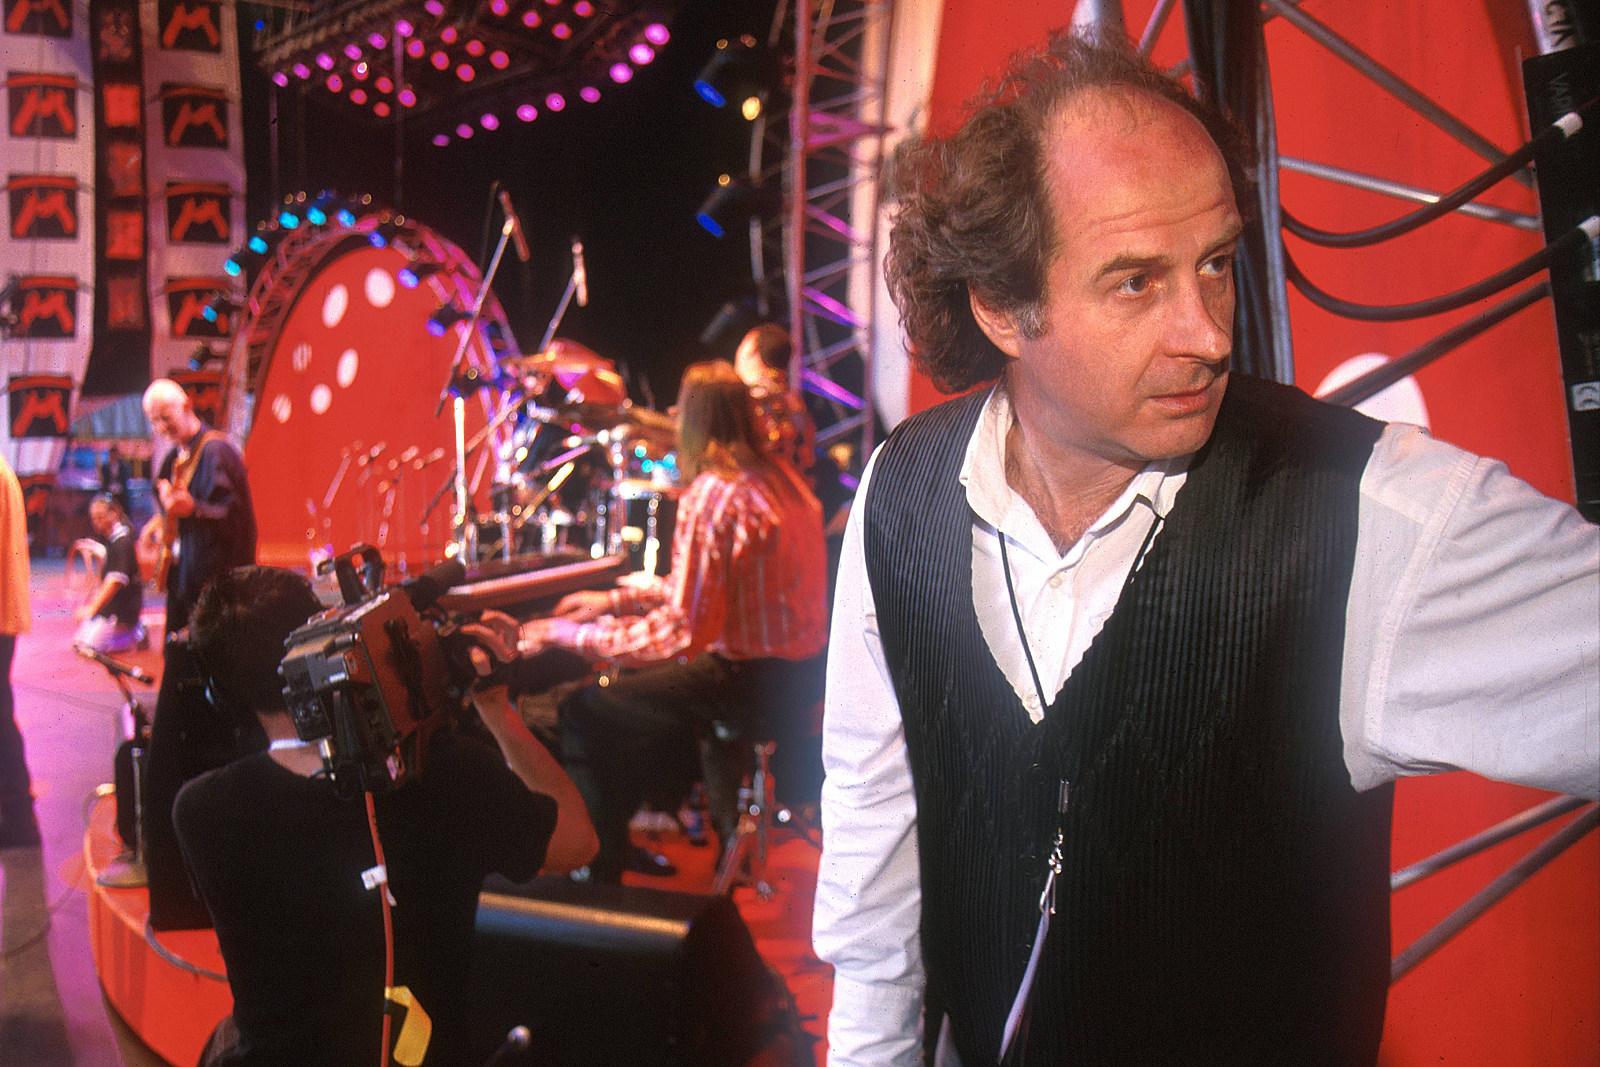 Michael Gudinski, Music Promoter, Dies at 68: Rockers React